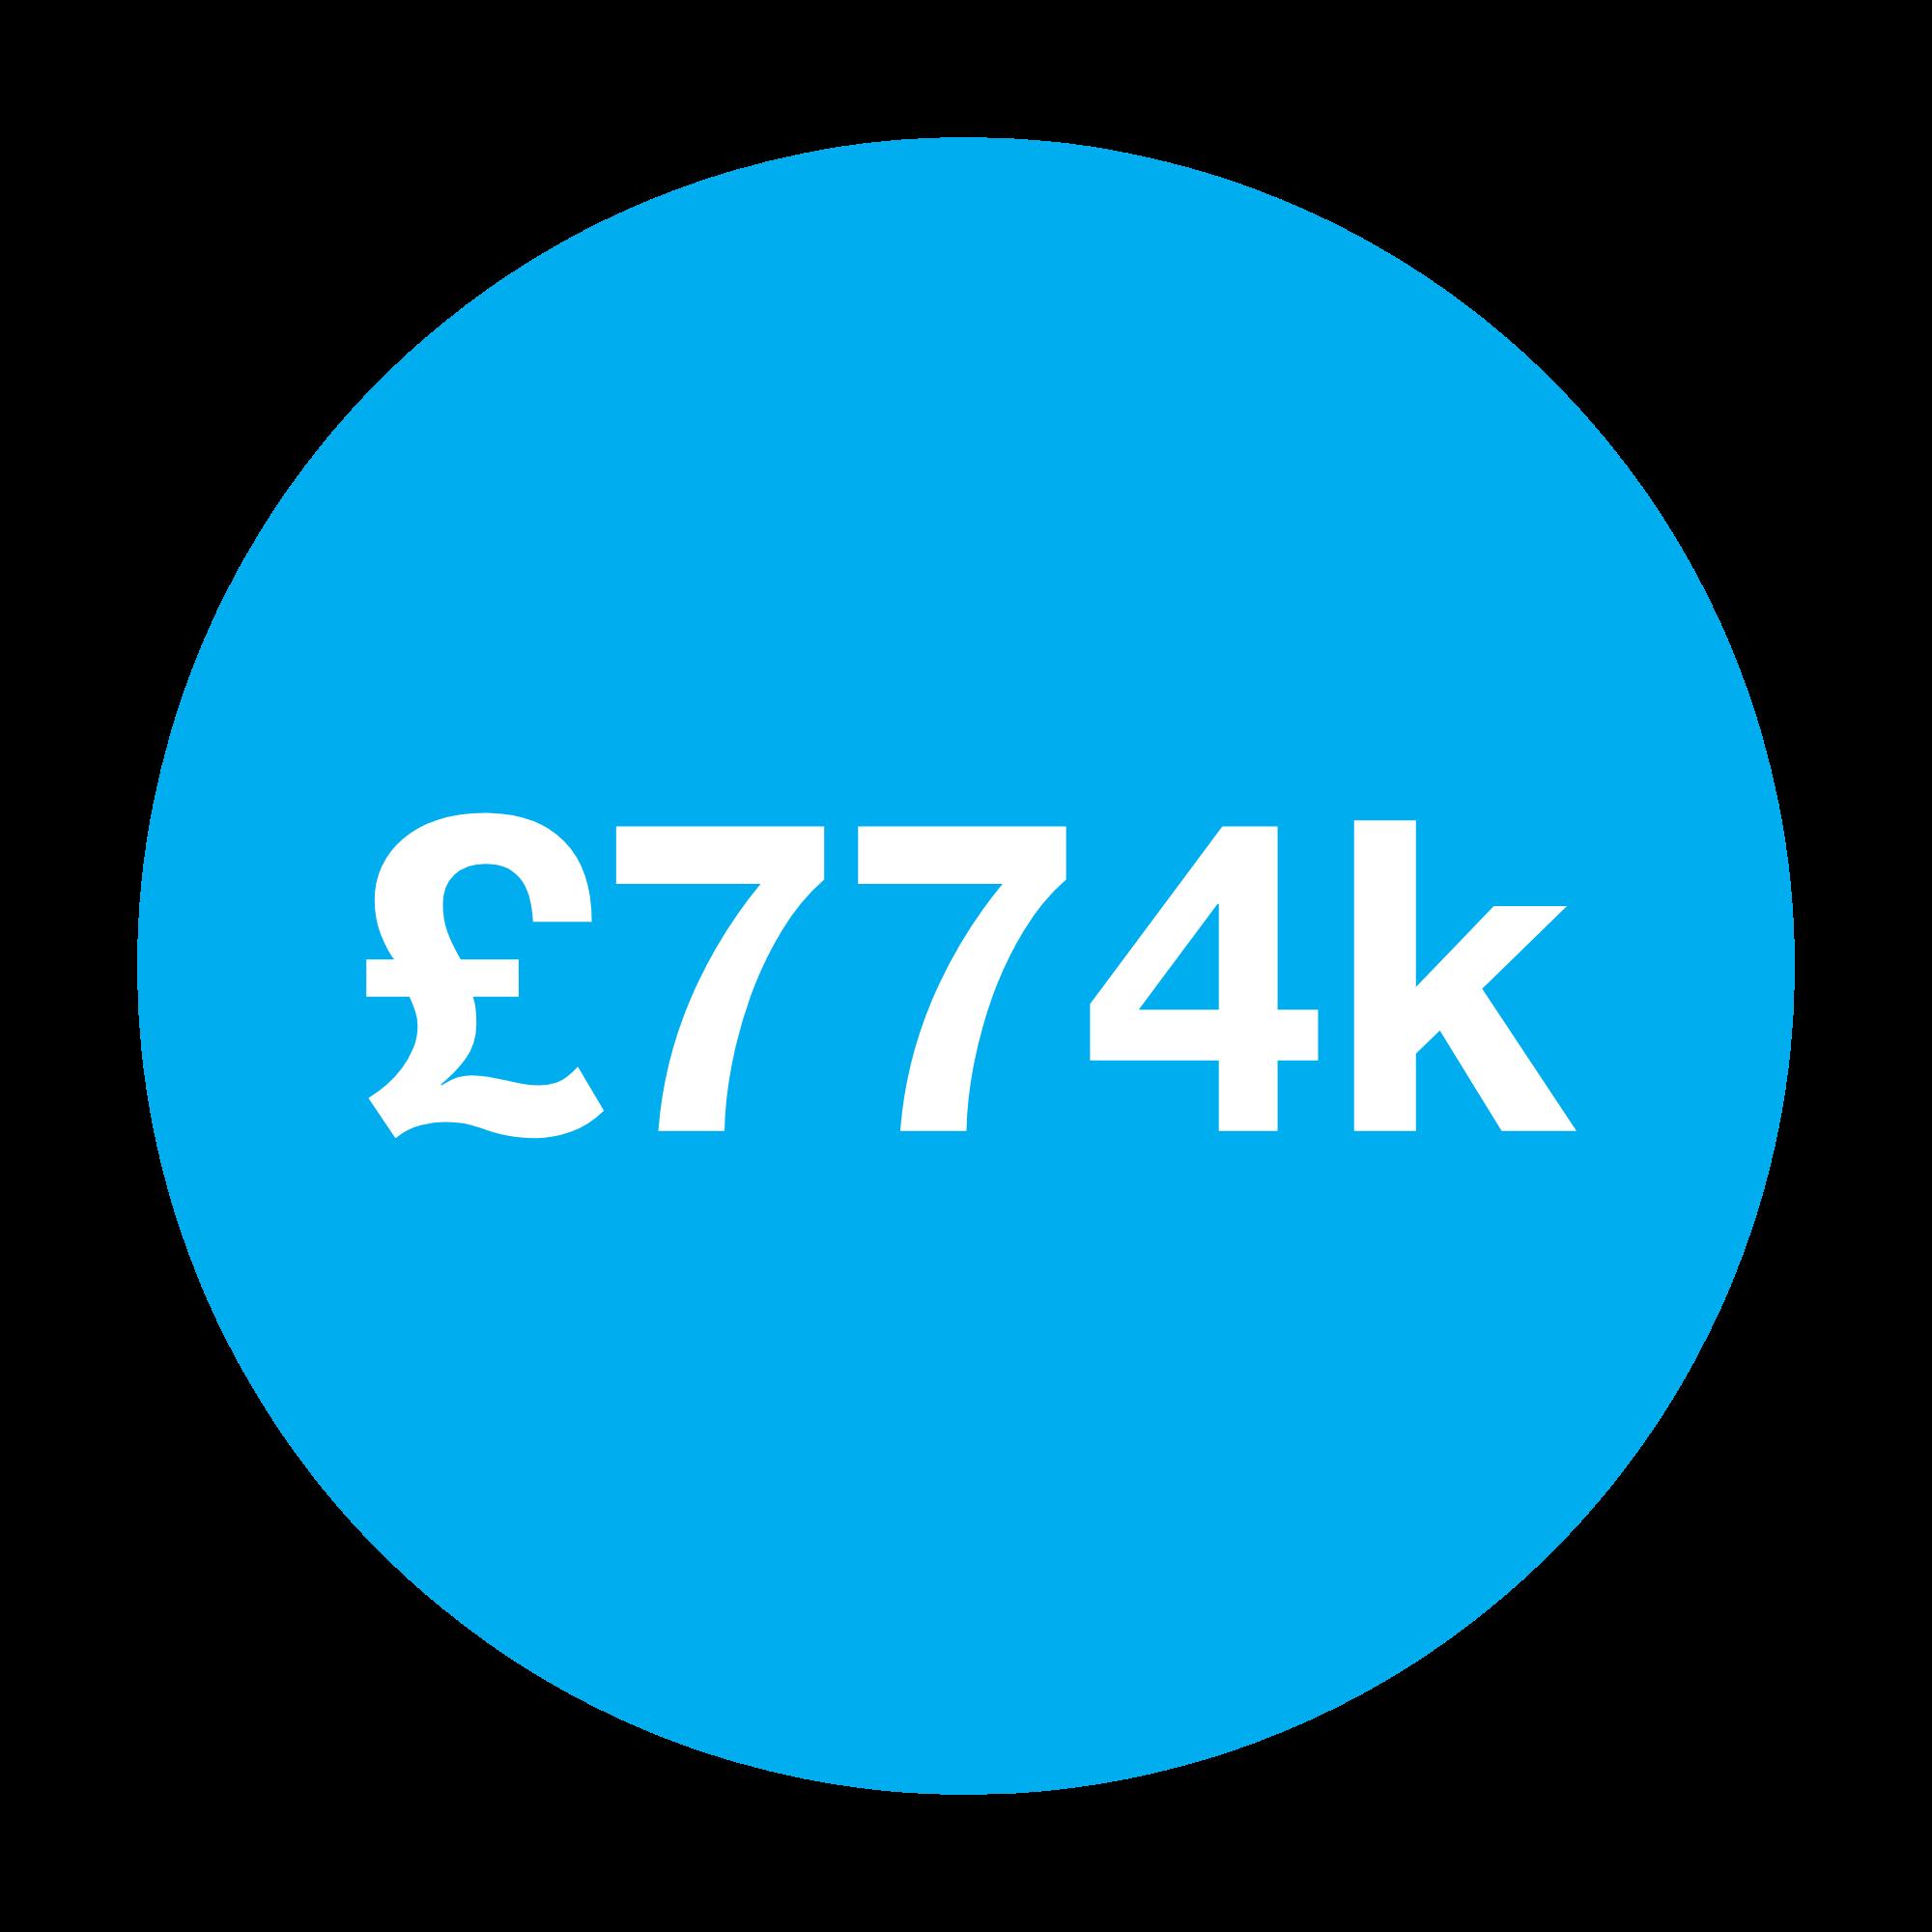 £774 thousand